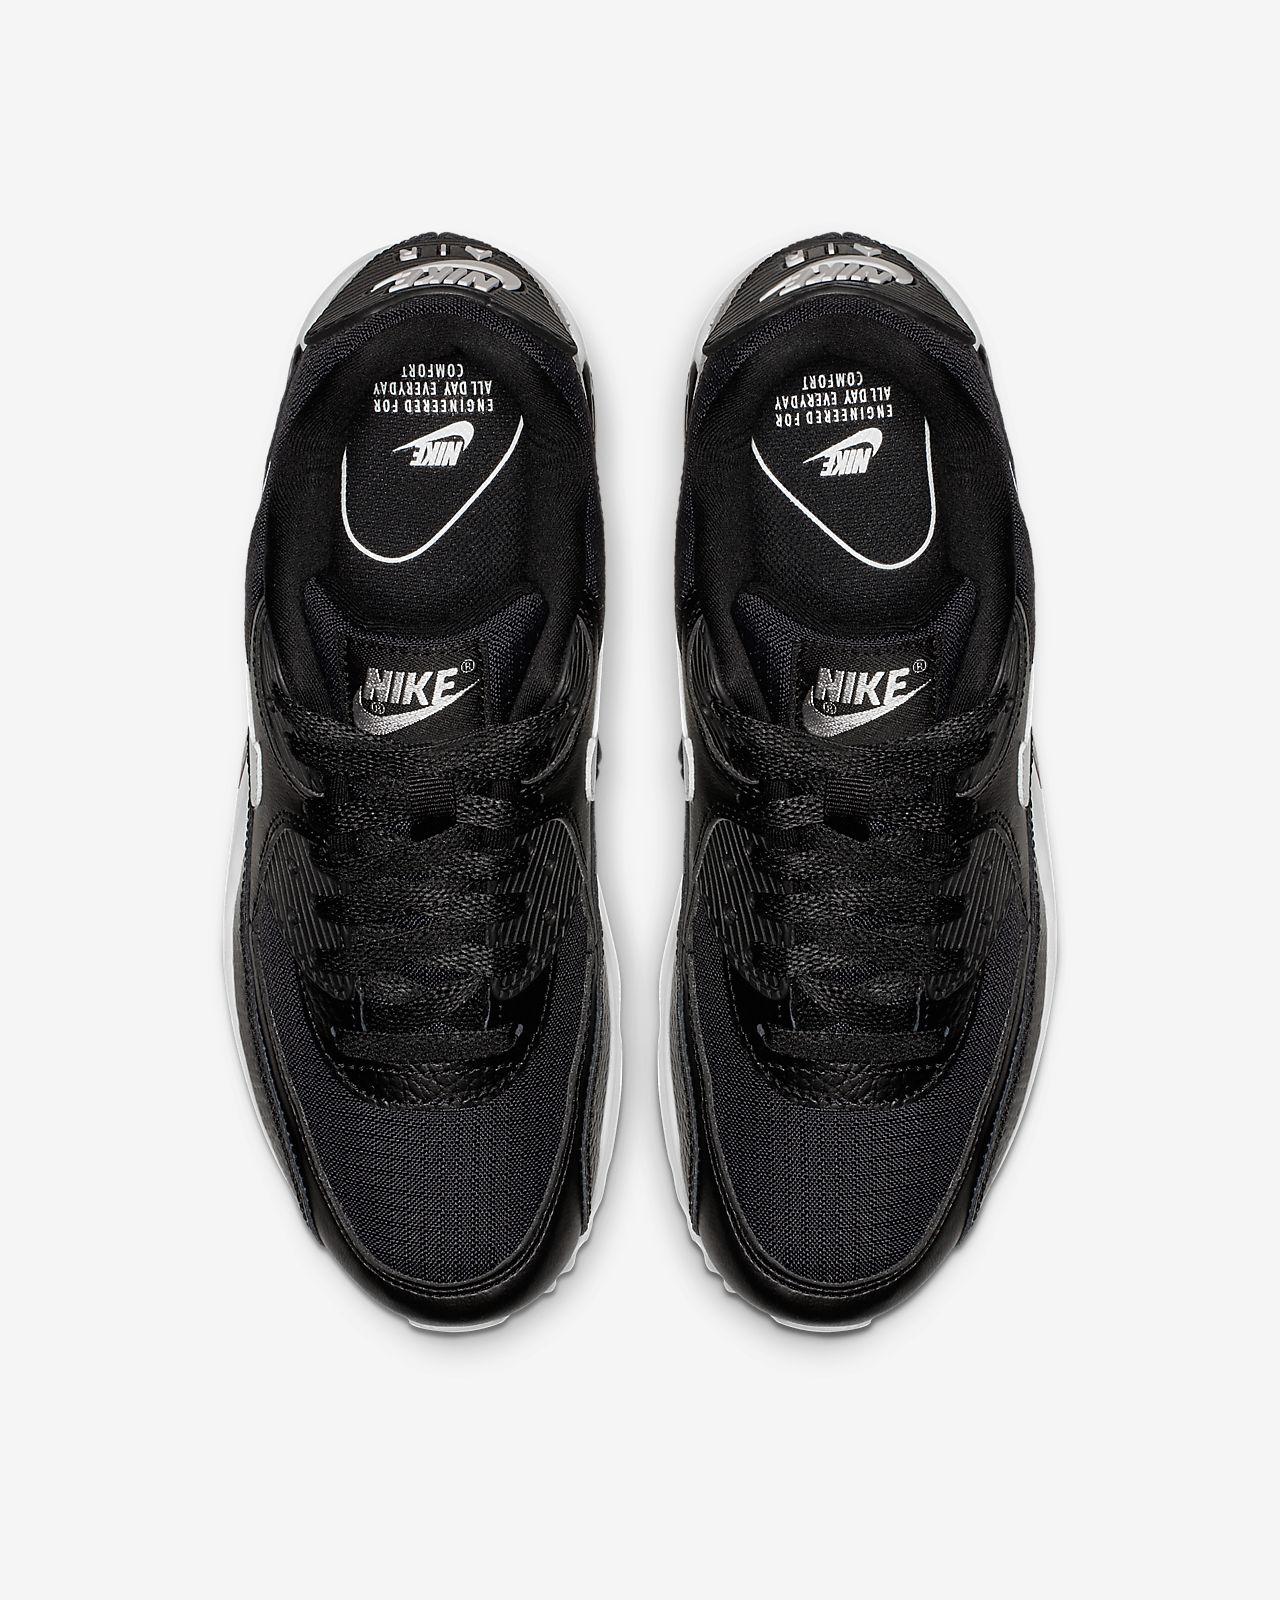 05a19ab4e5 Low Resolution Nike Air Max 90 Women's Shoe Nike Air Max 90 Women's Shoe